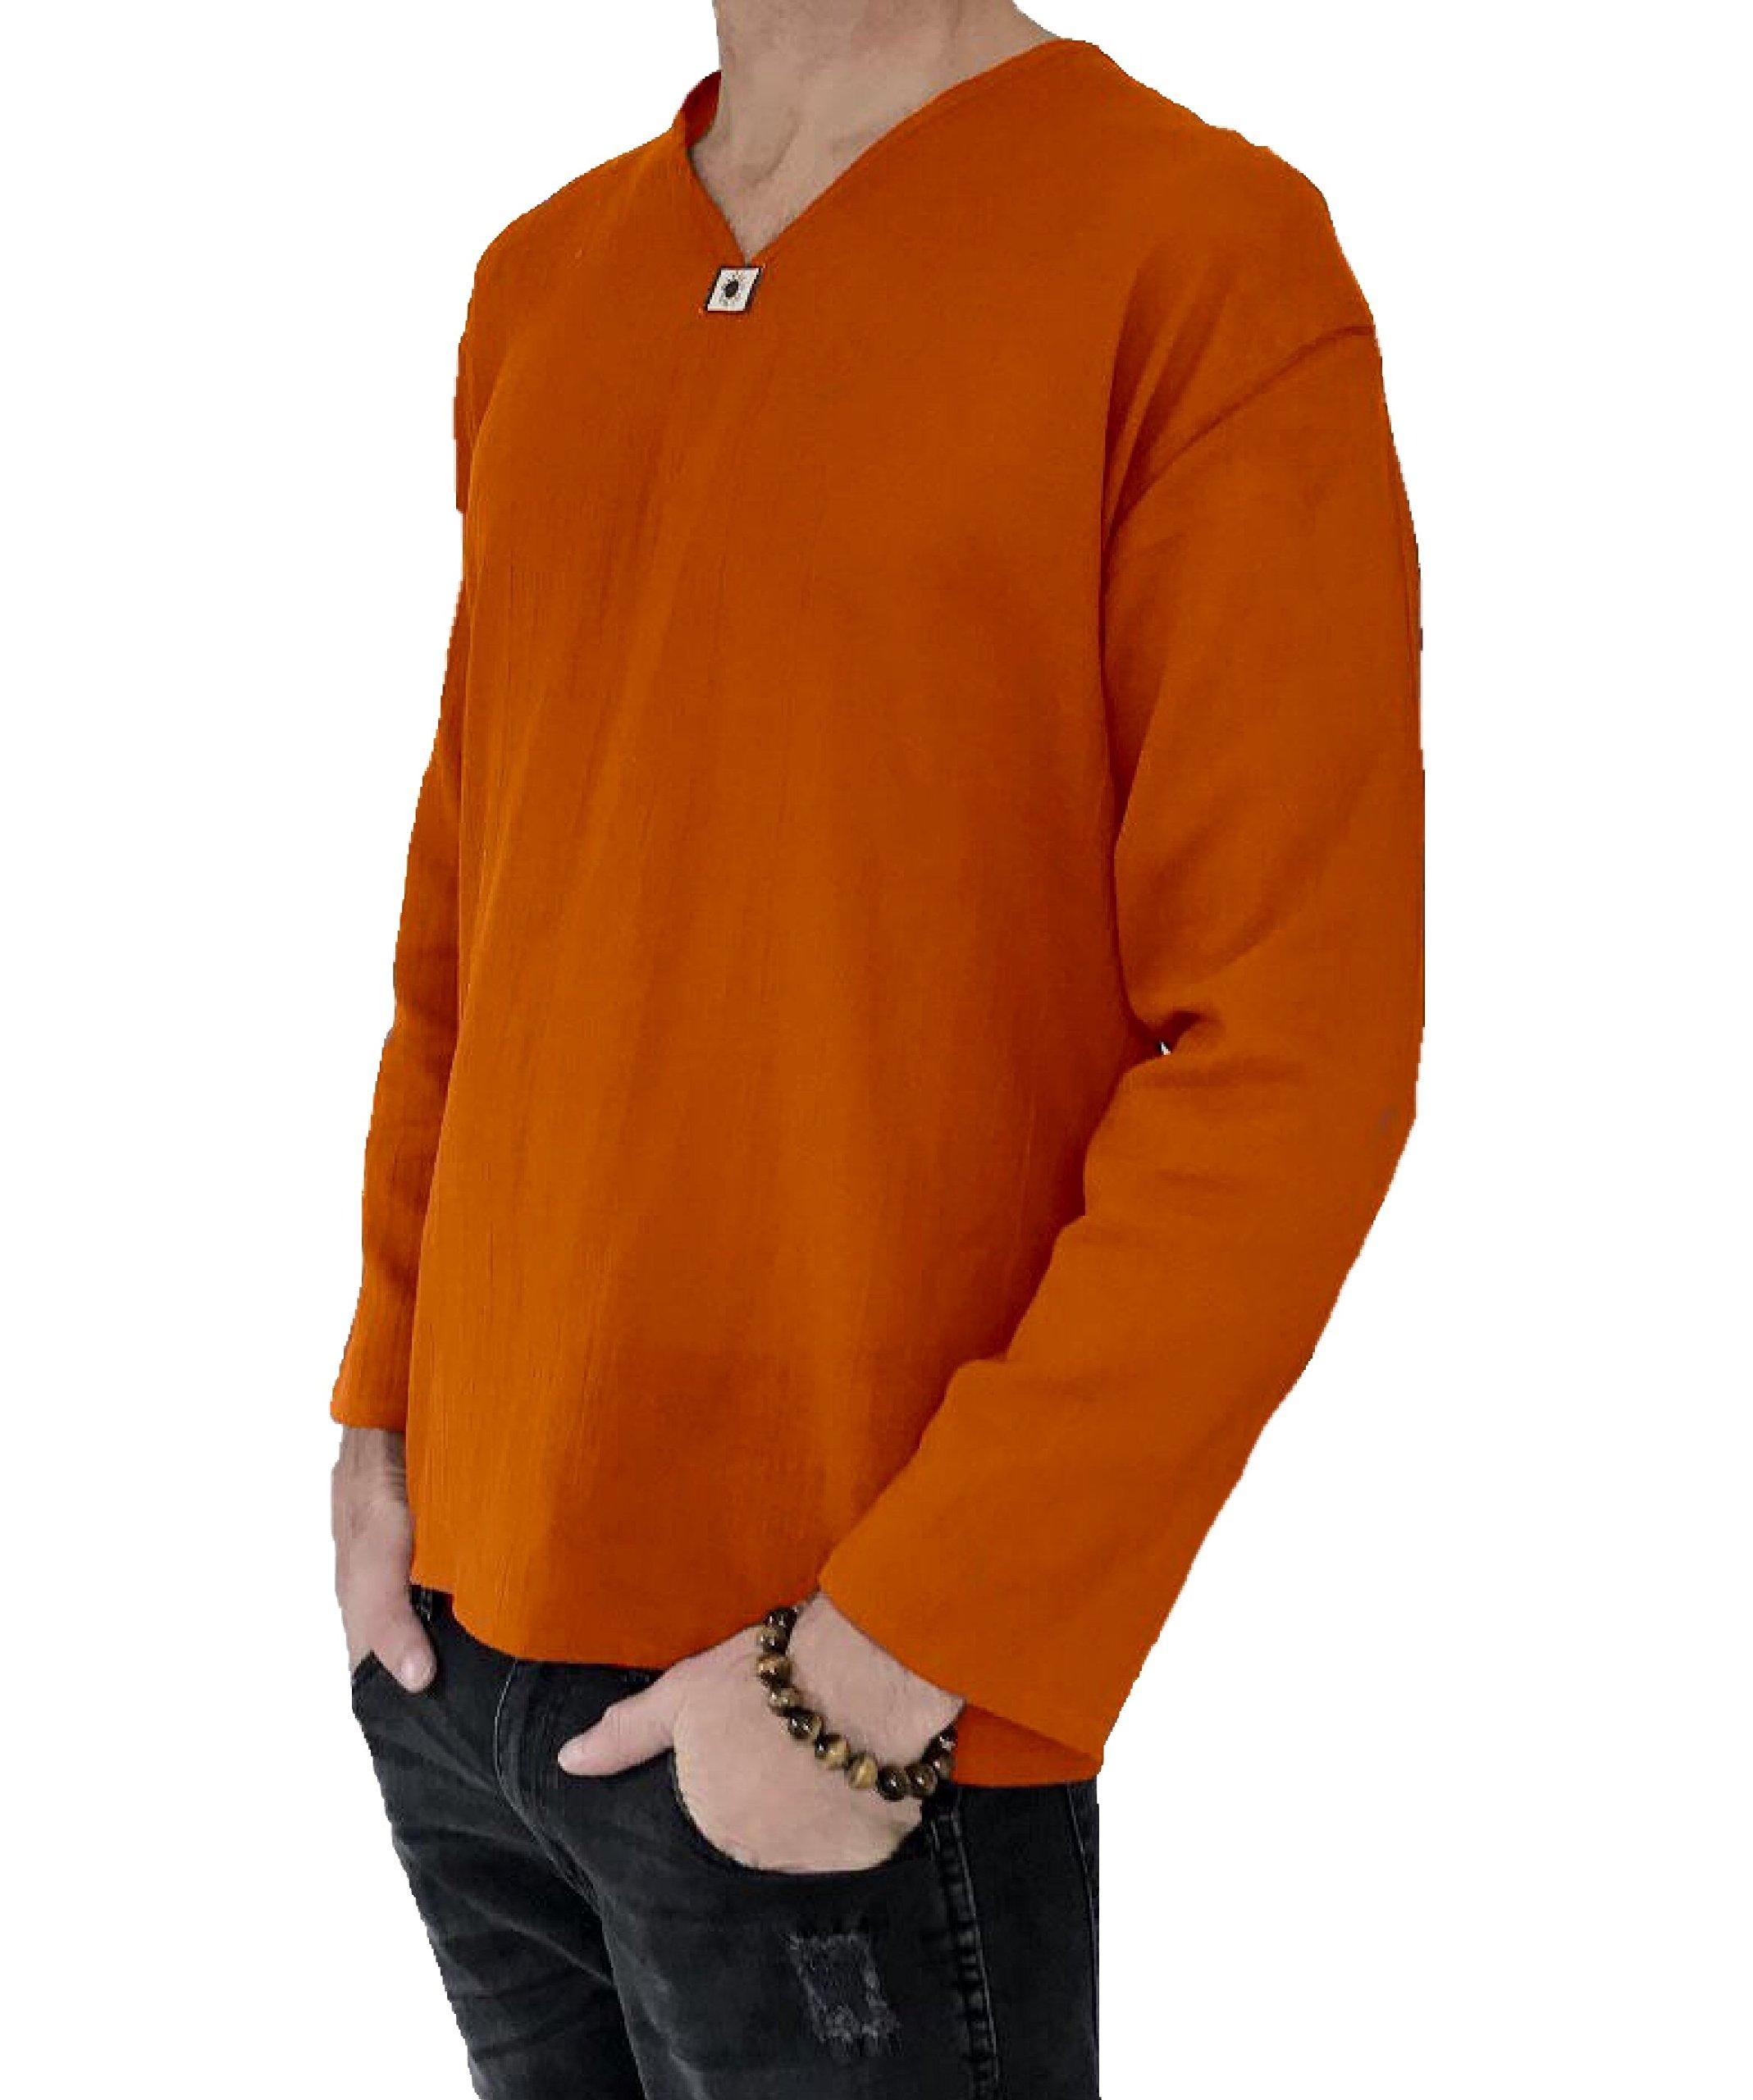 Love Quality Men's Summer T-Shirt 100% Cotton Hippie Shirt V-Neck Beach Yoga Top (XXXXX-Large, Orange)